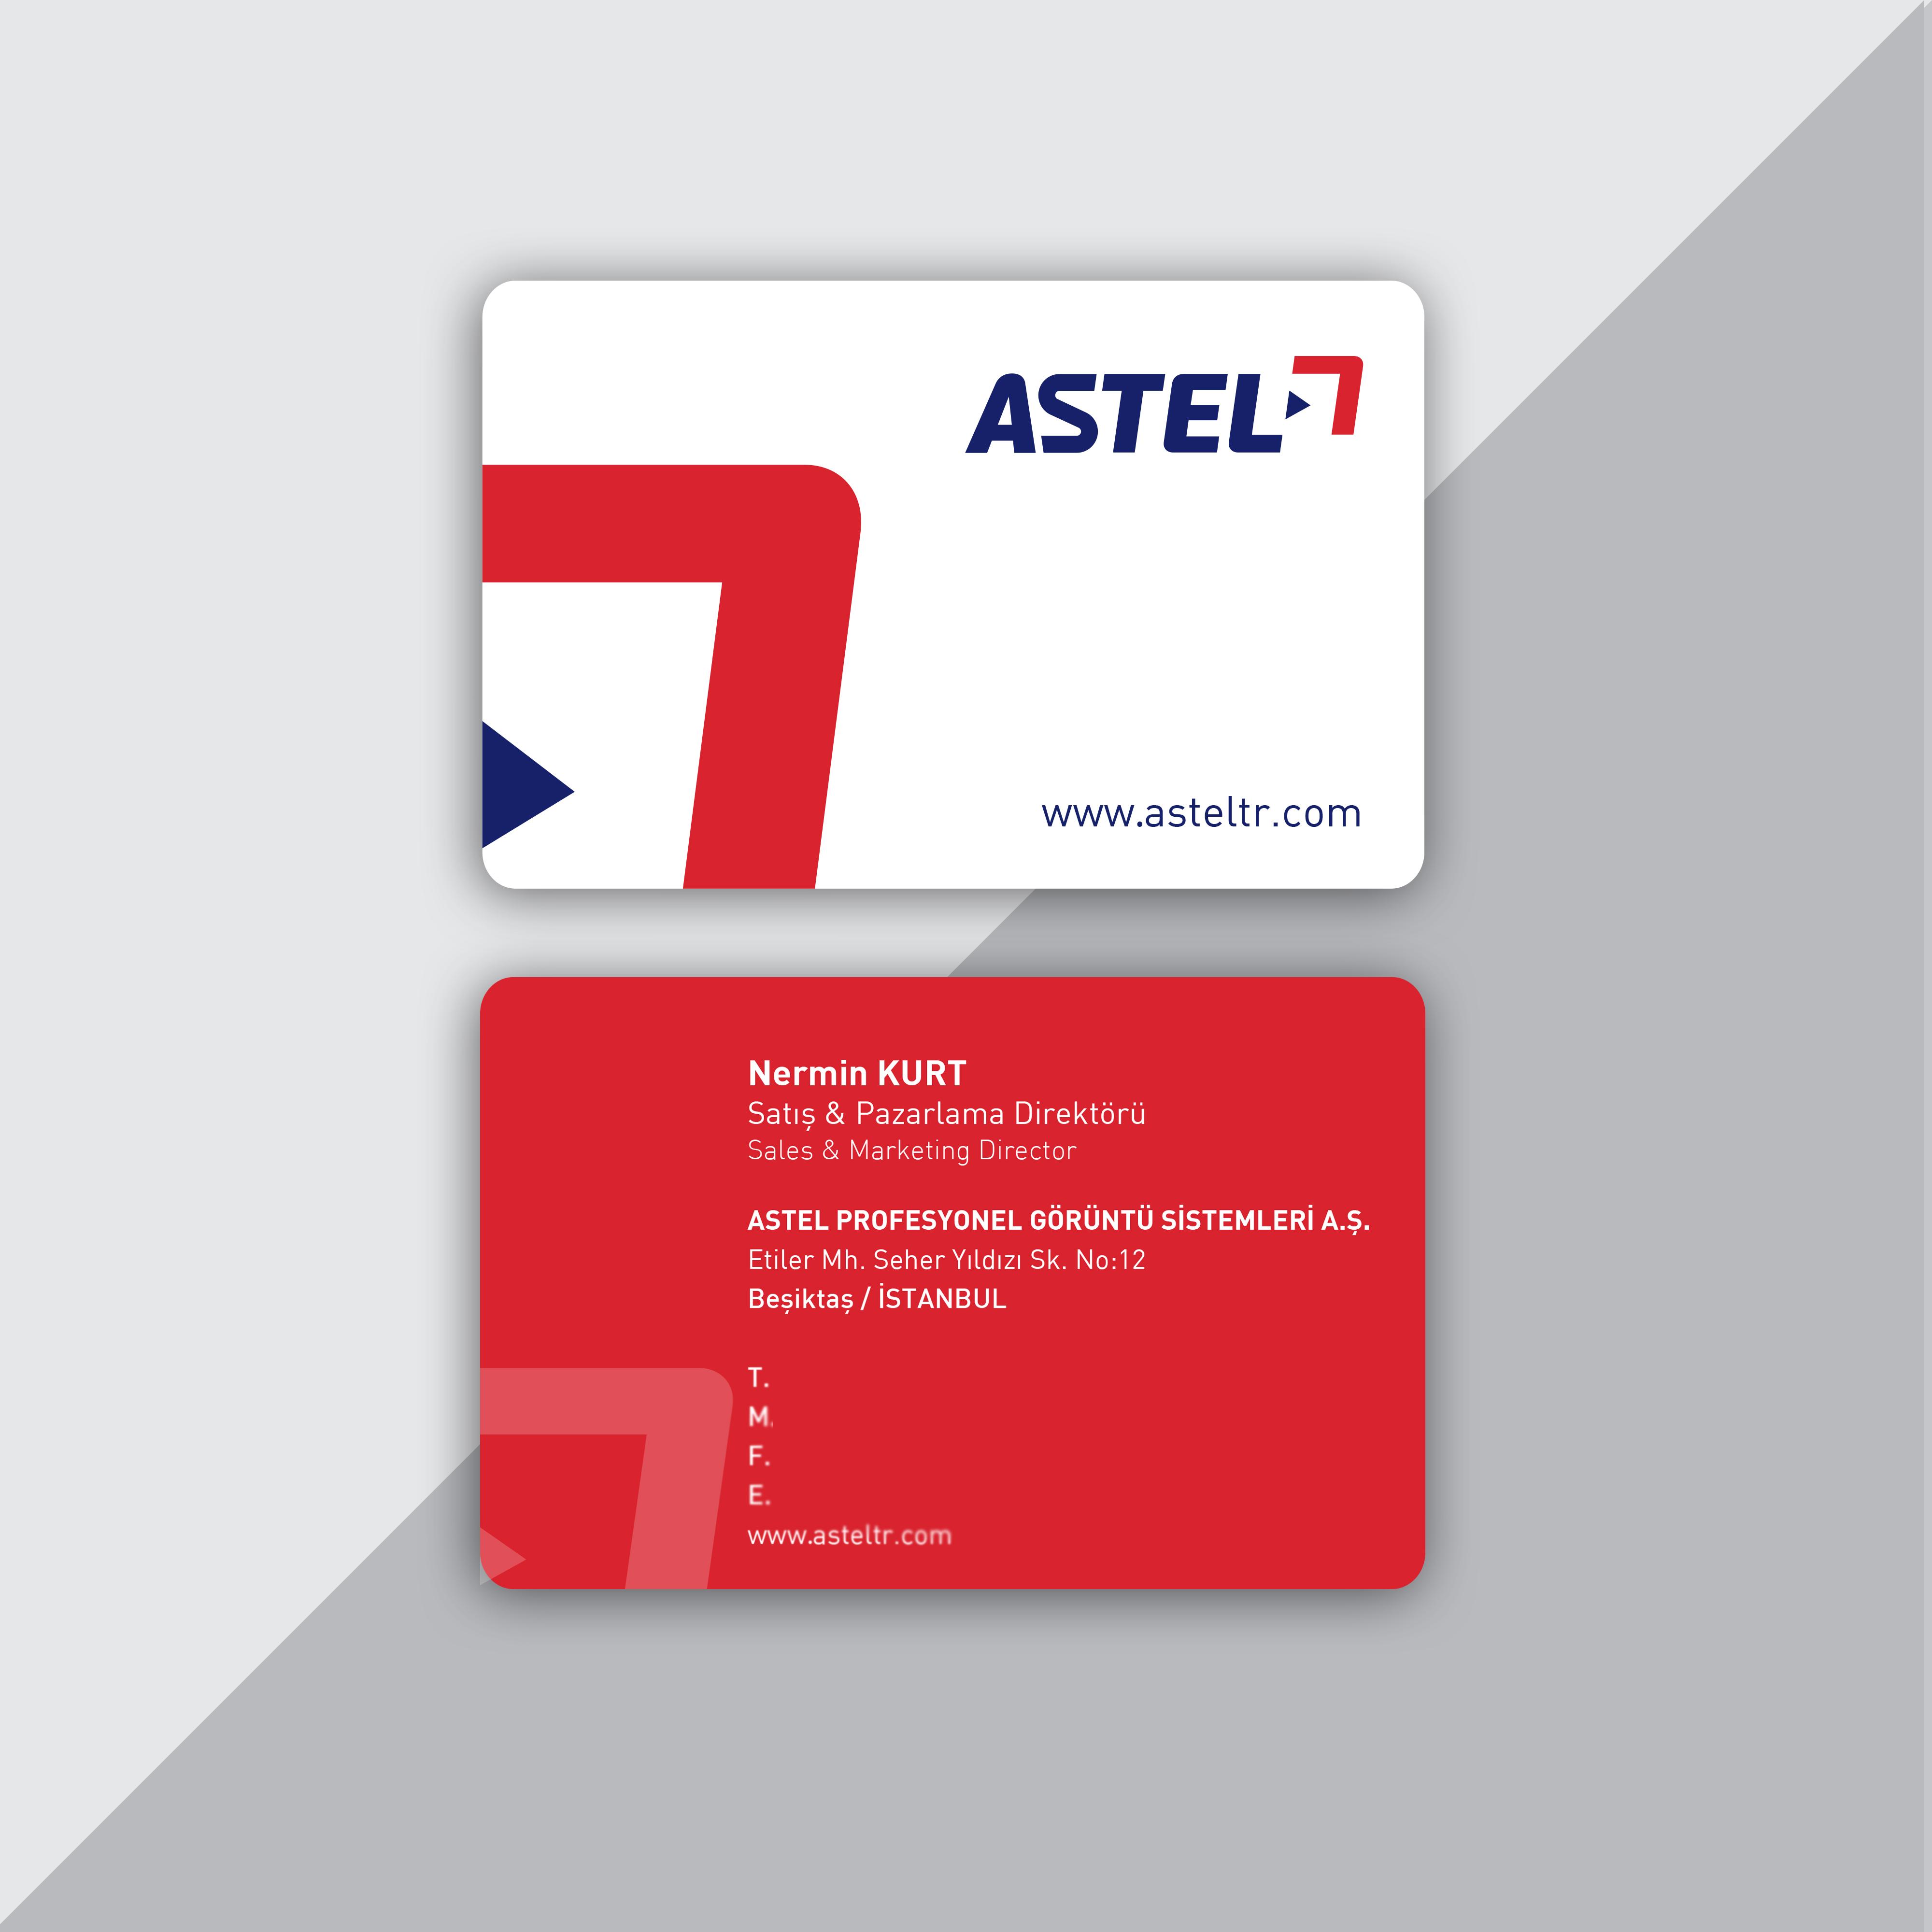 ASTEL